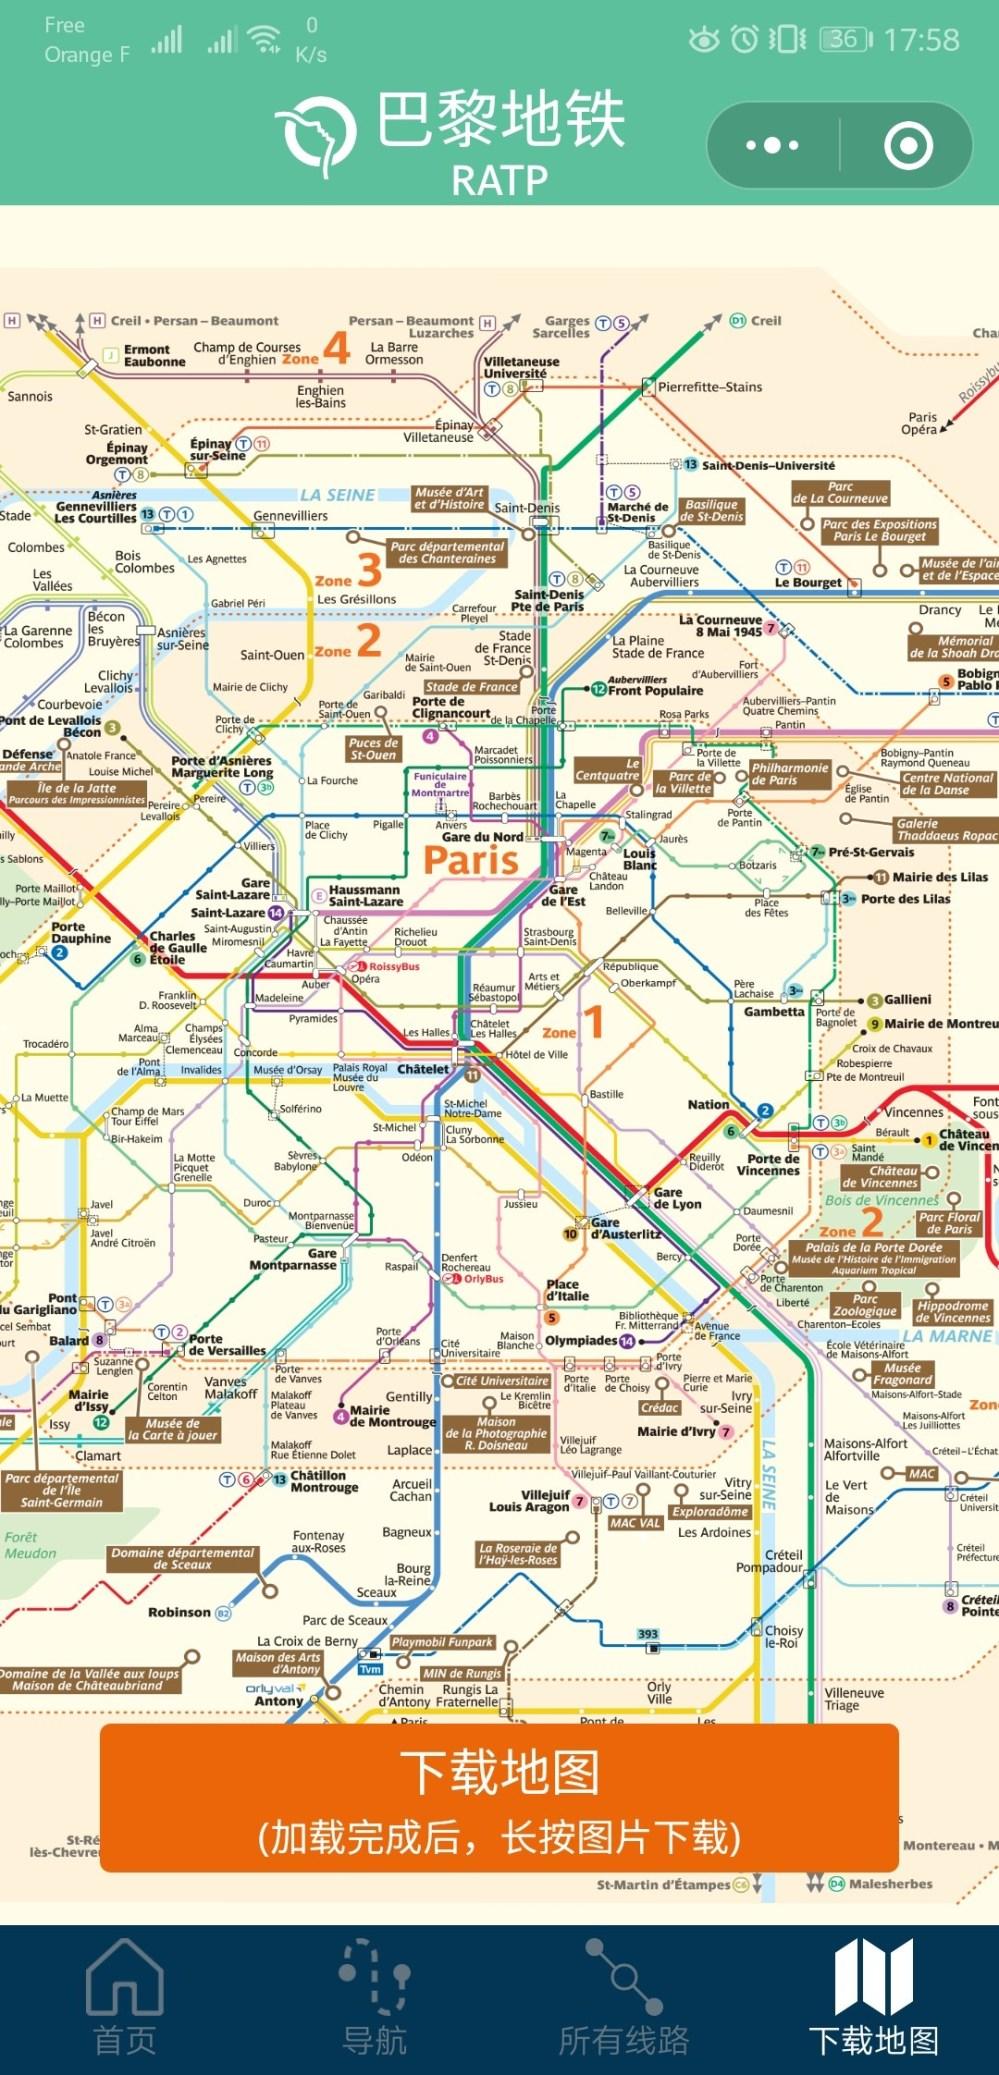 RATP wechat miniprogram